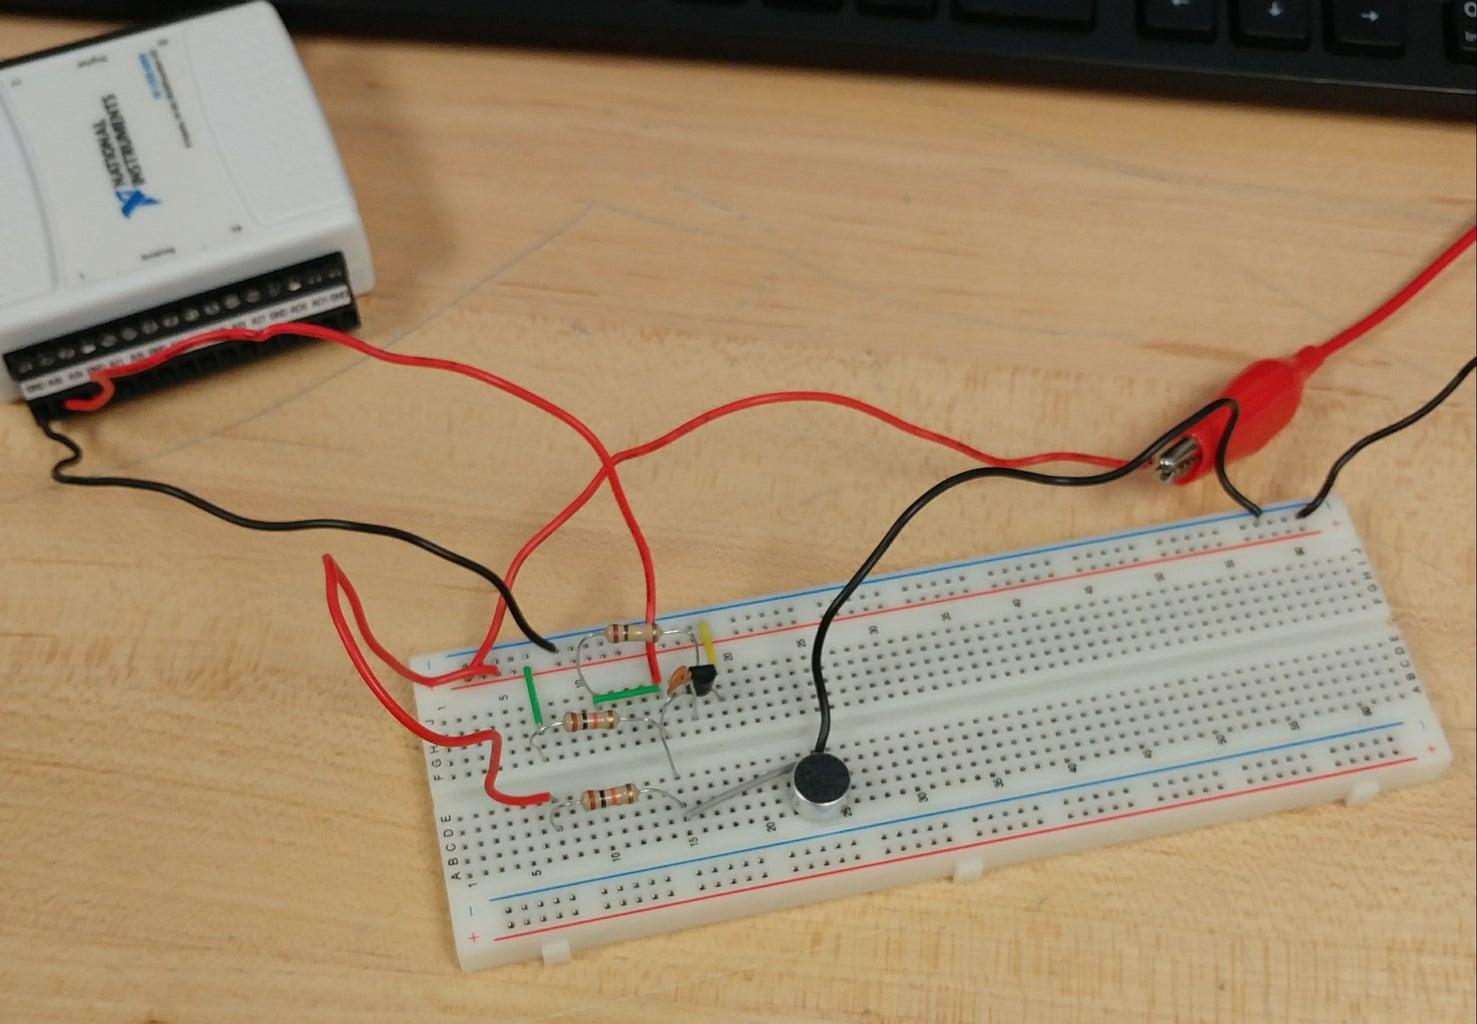 Next, the Analog Circuit